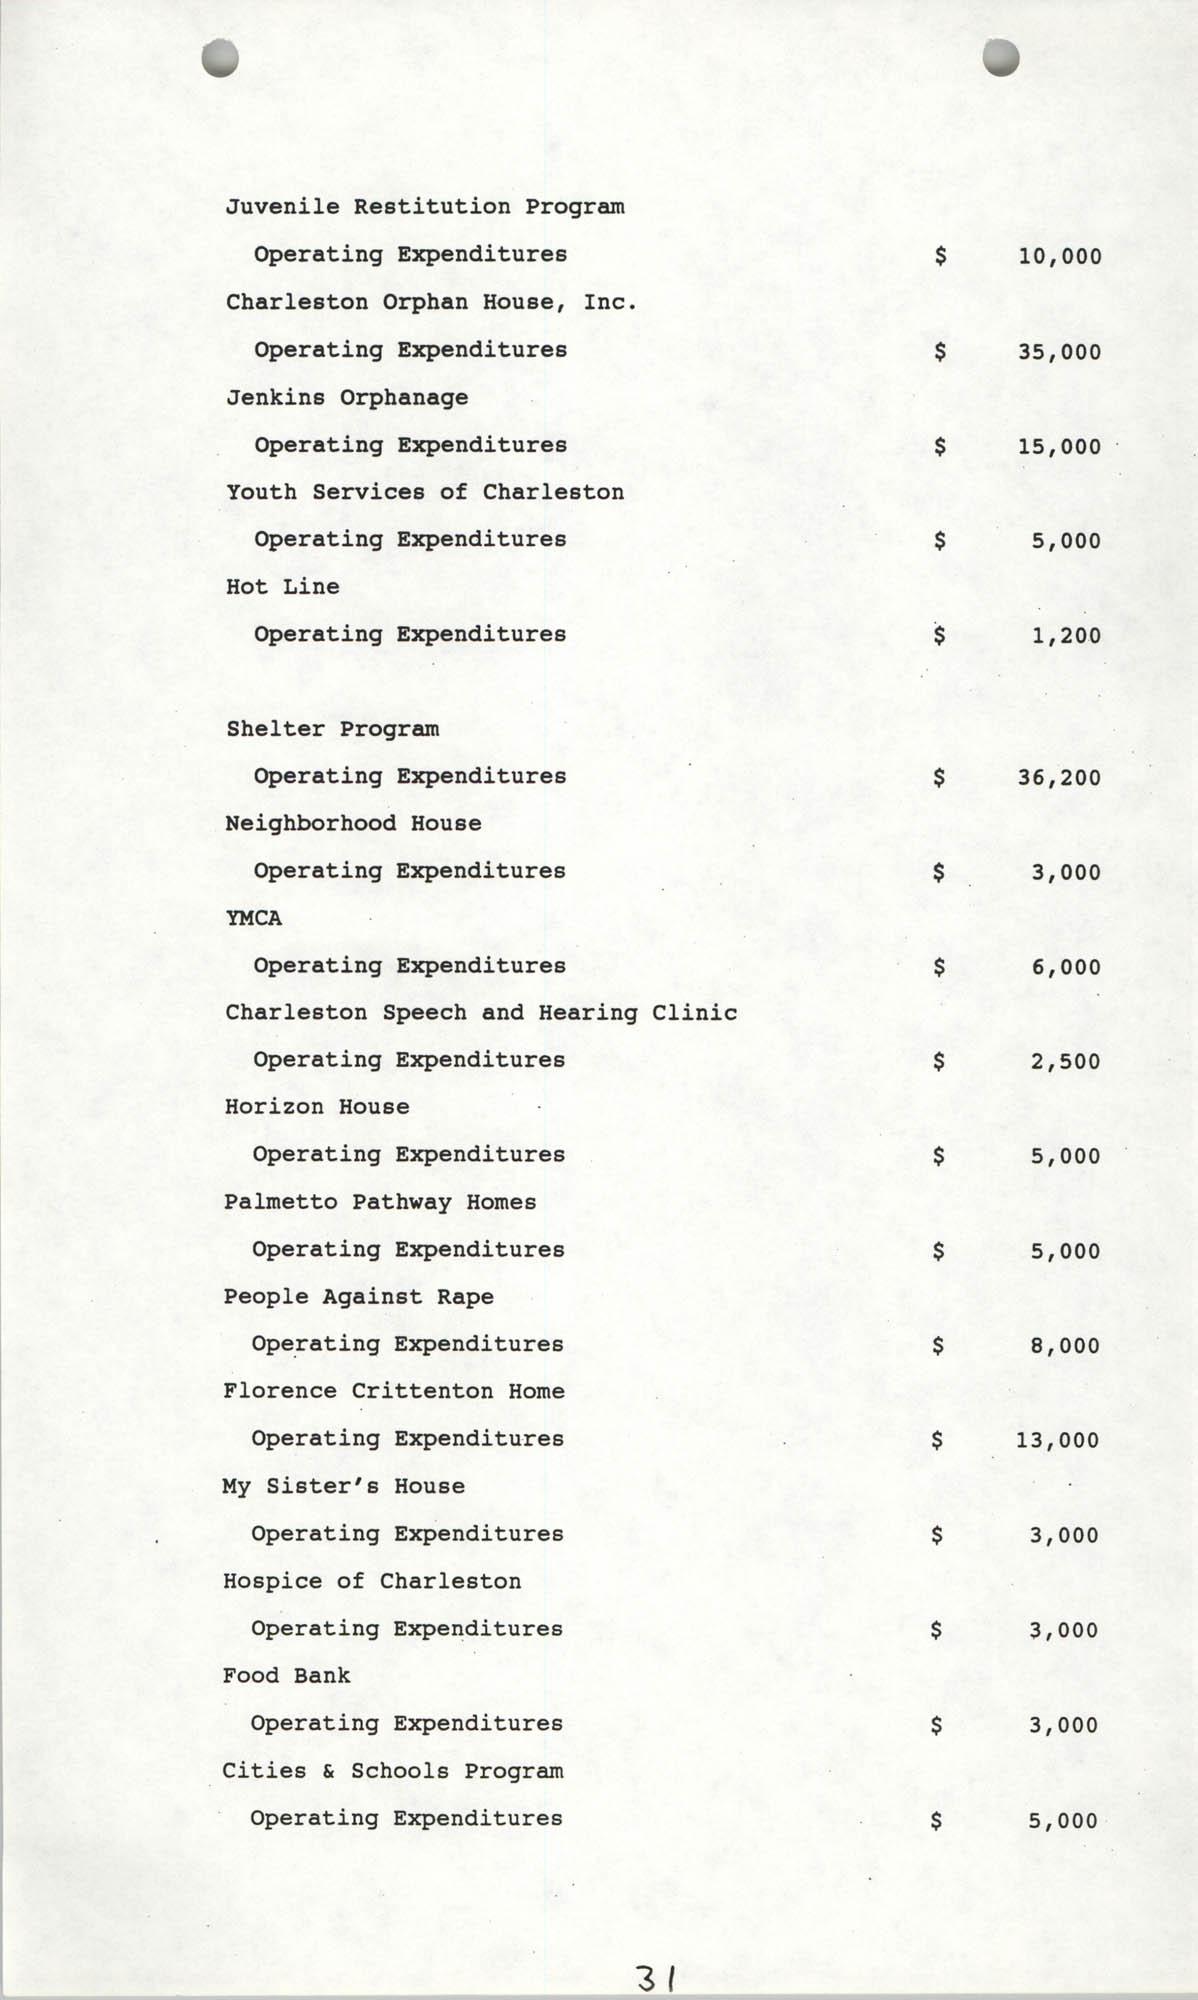 The City Council of Charleston, South Carolina, 1993 Budget, Page 31